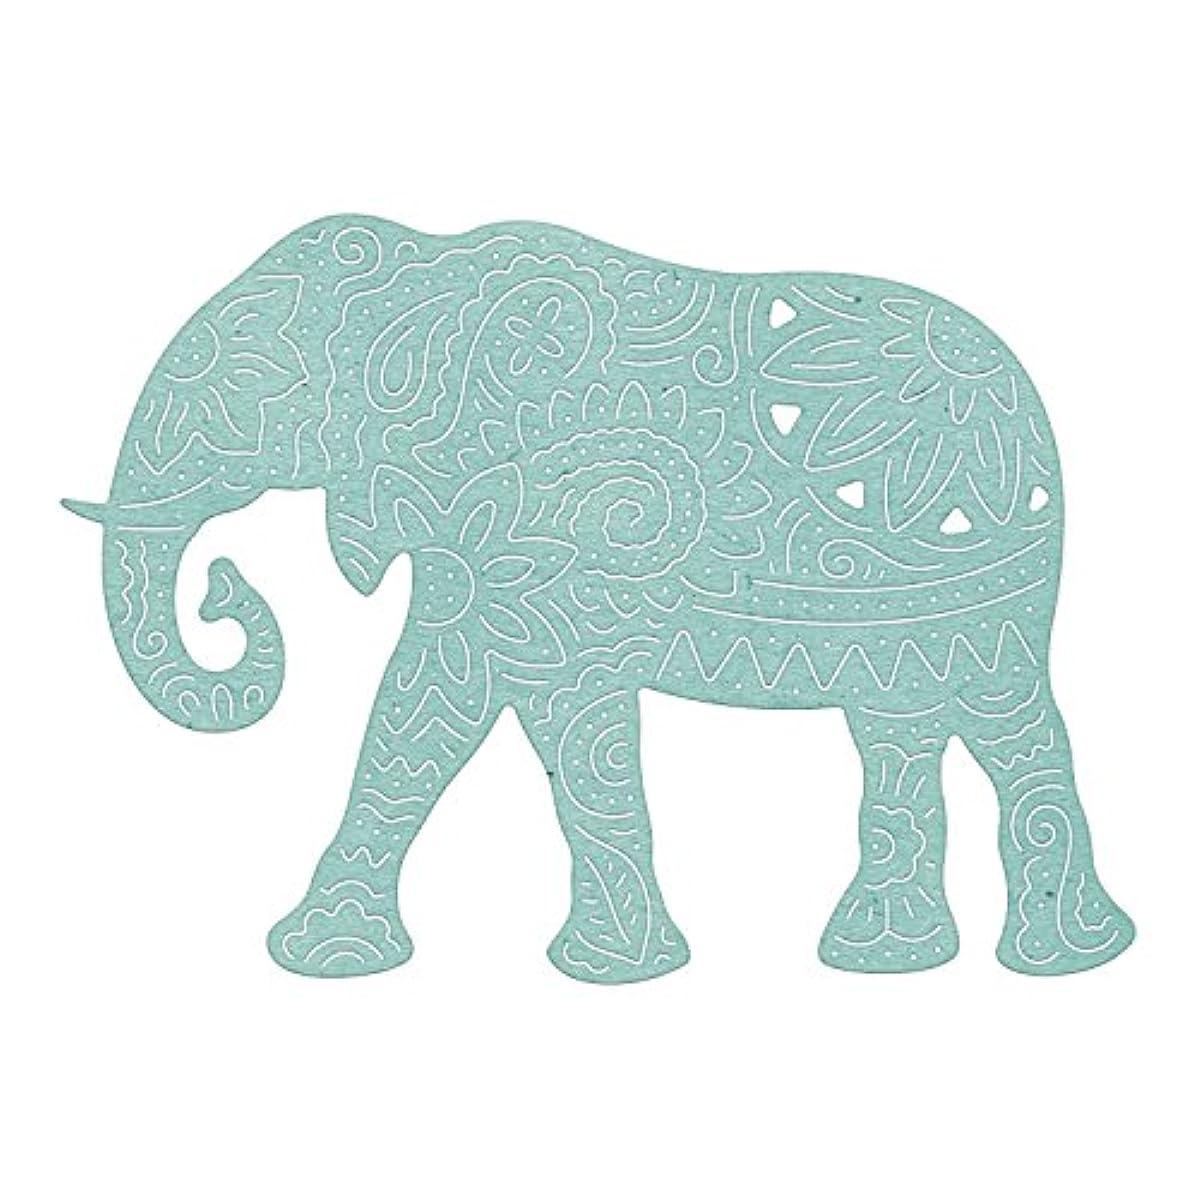 Cheery Lynn Designs Bohemian Collection Elephant Die